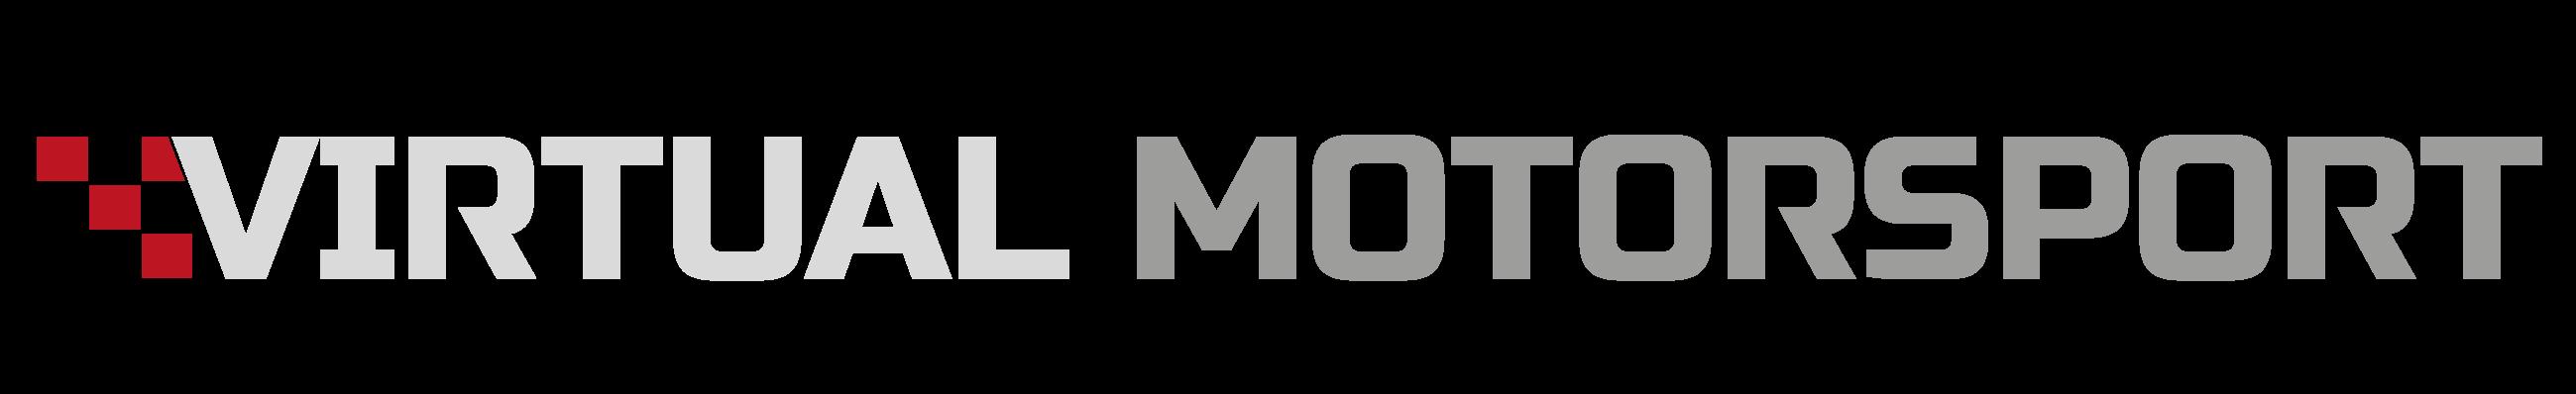 Virtual-Motorsport